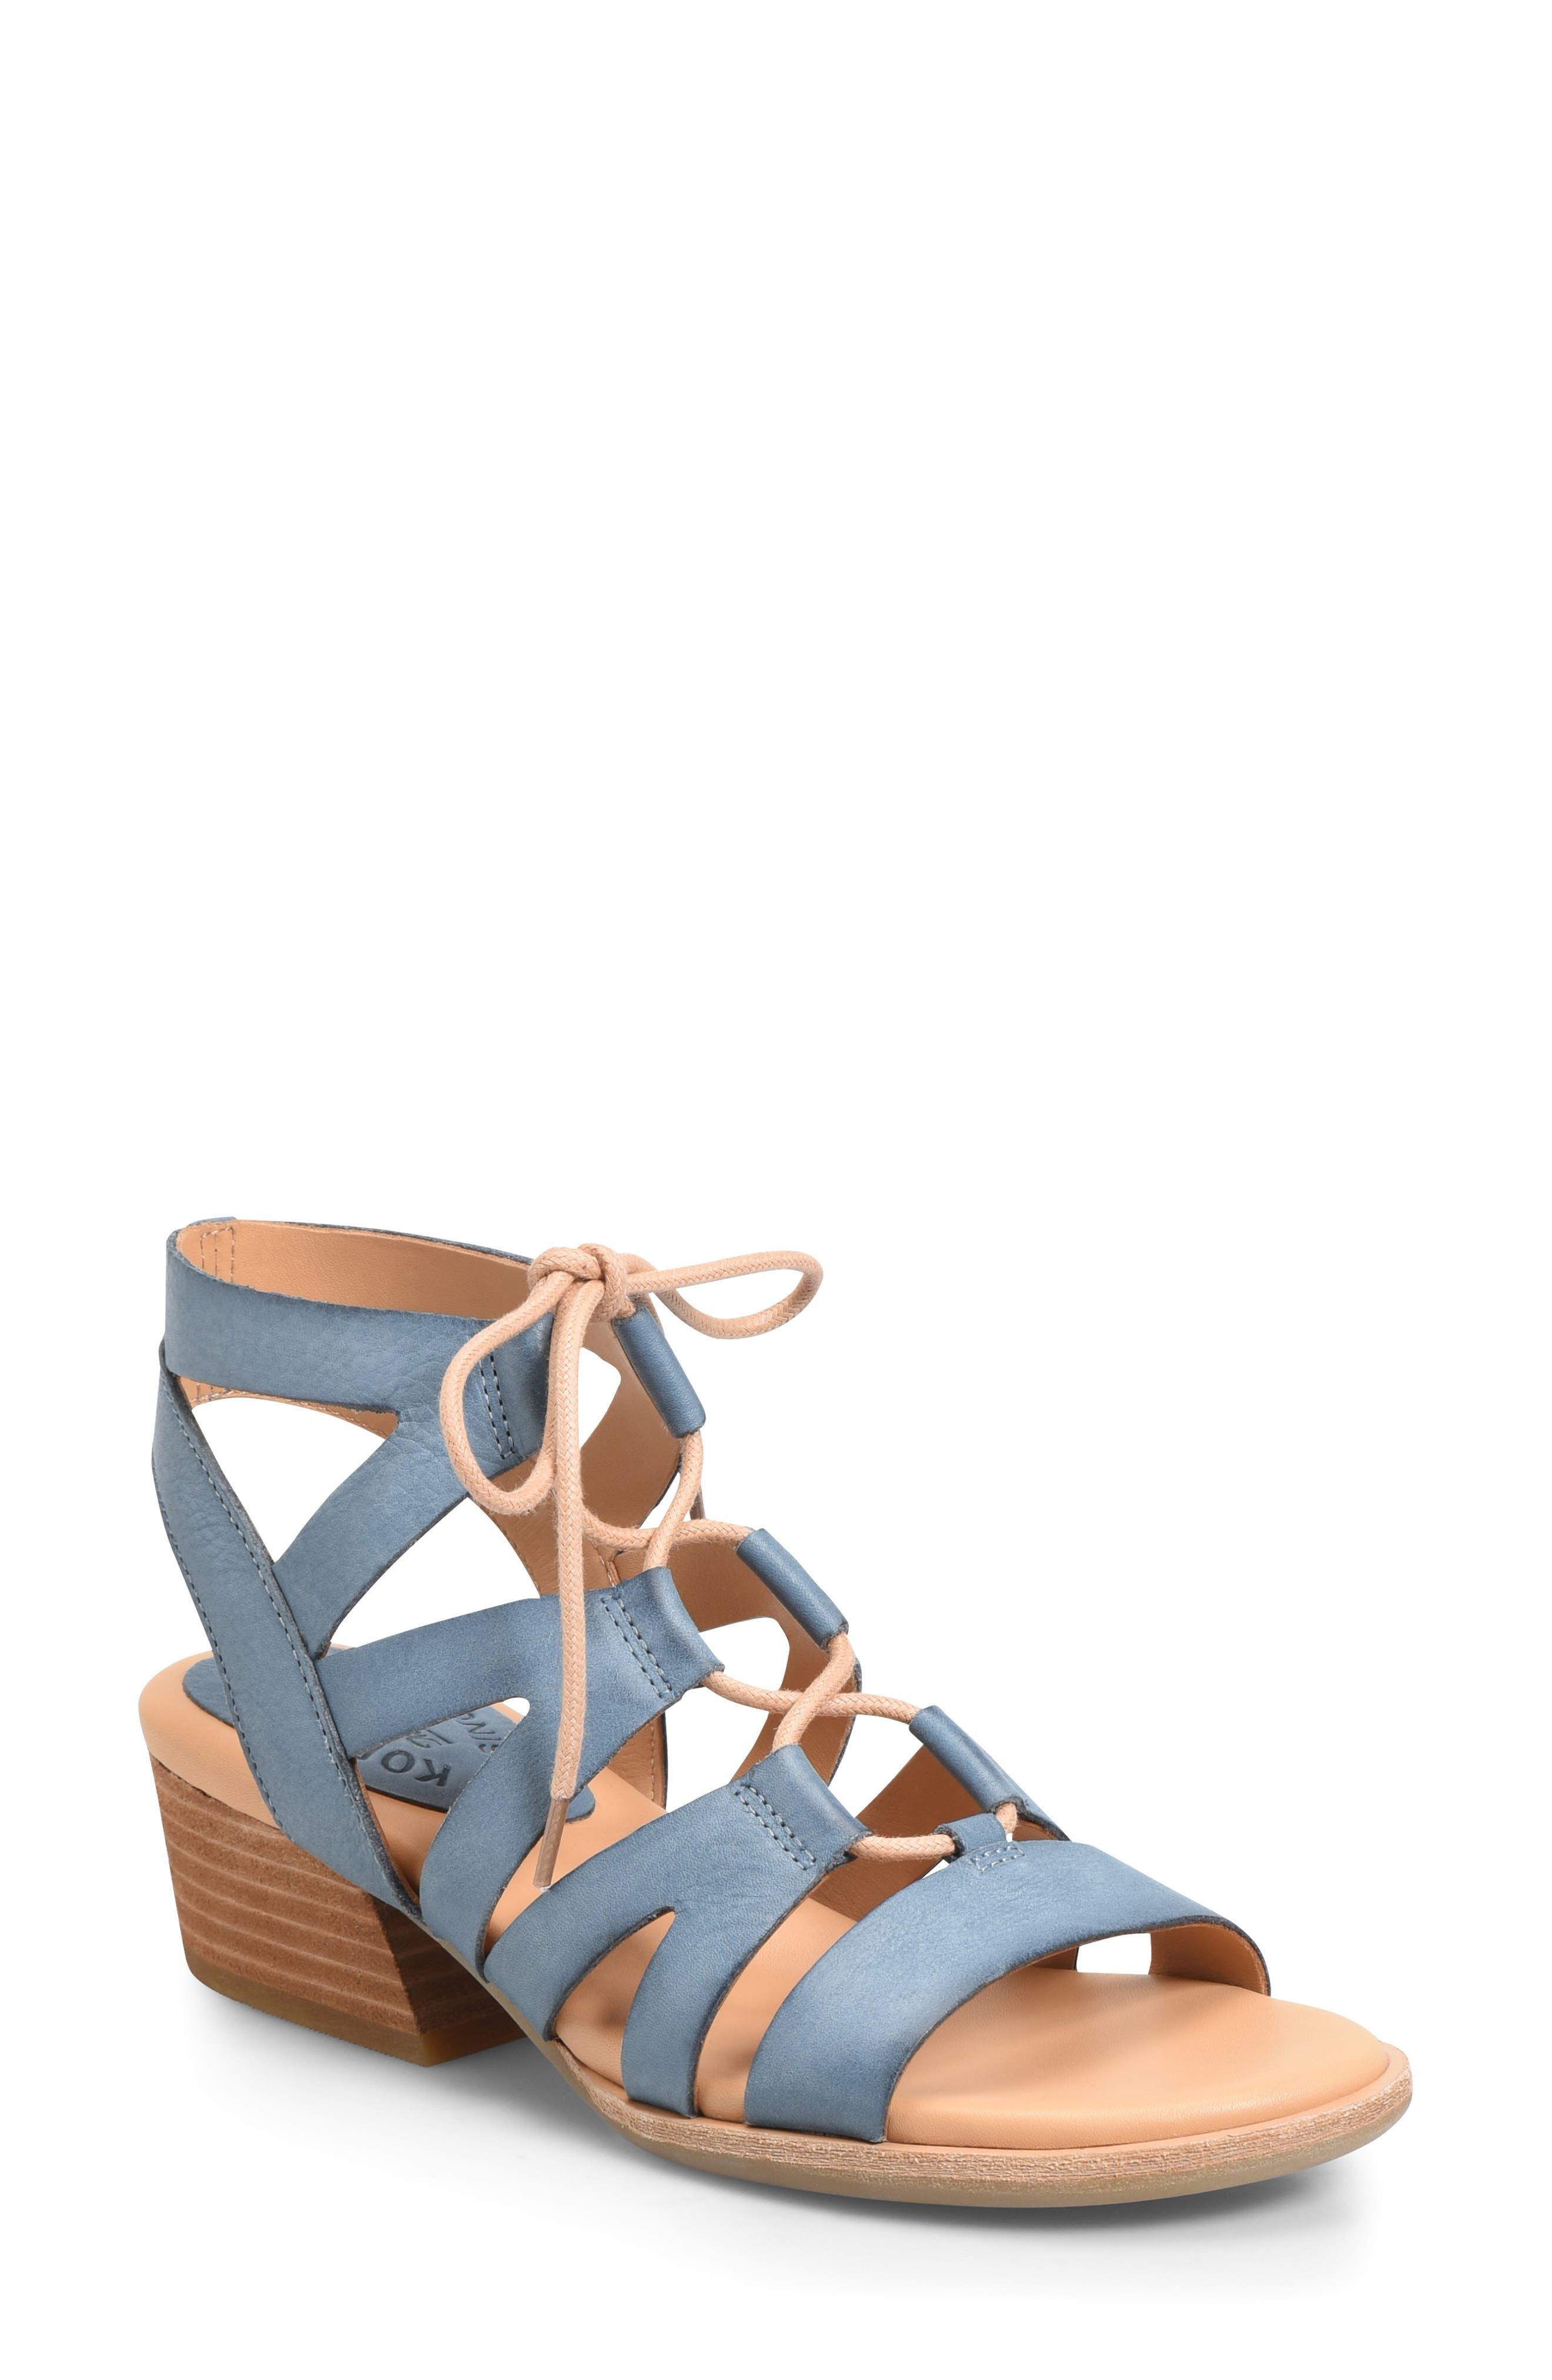 Kork-Ease Skyway Sandal, Blue